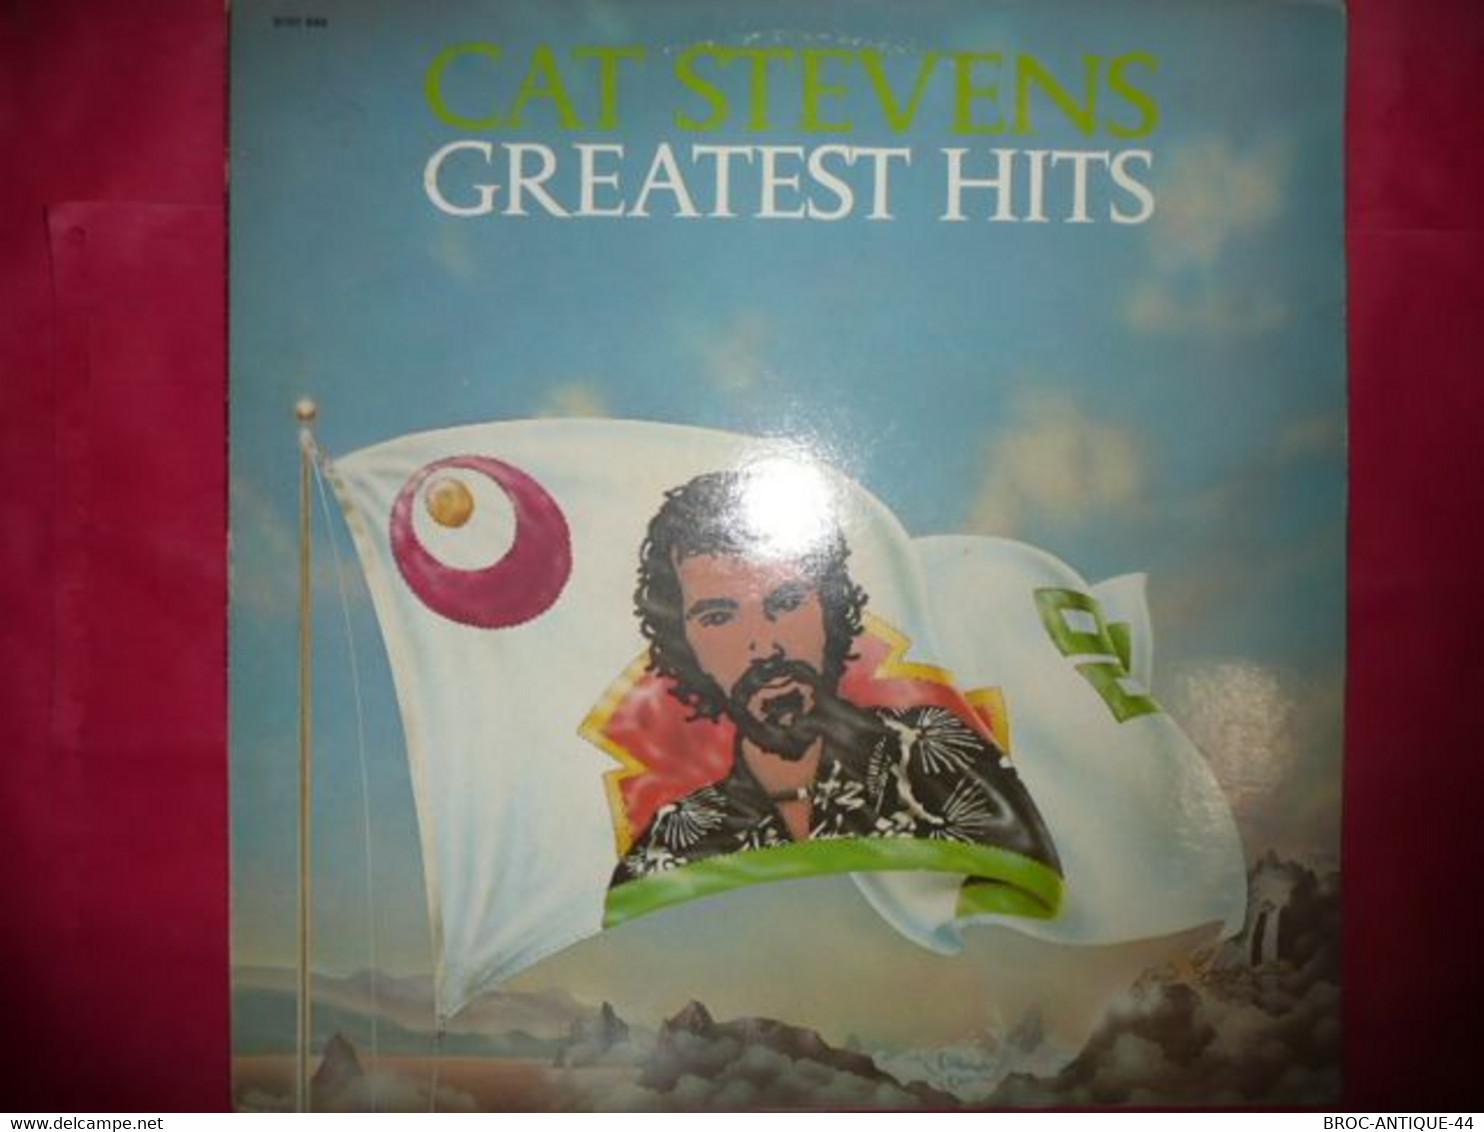 LP33 N°7070 - CAT STEVENS - 9101 646 - Rock